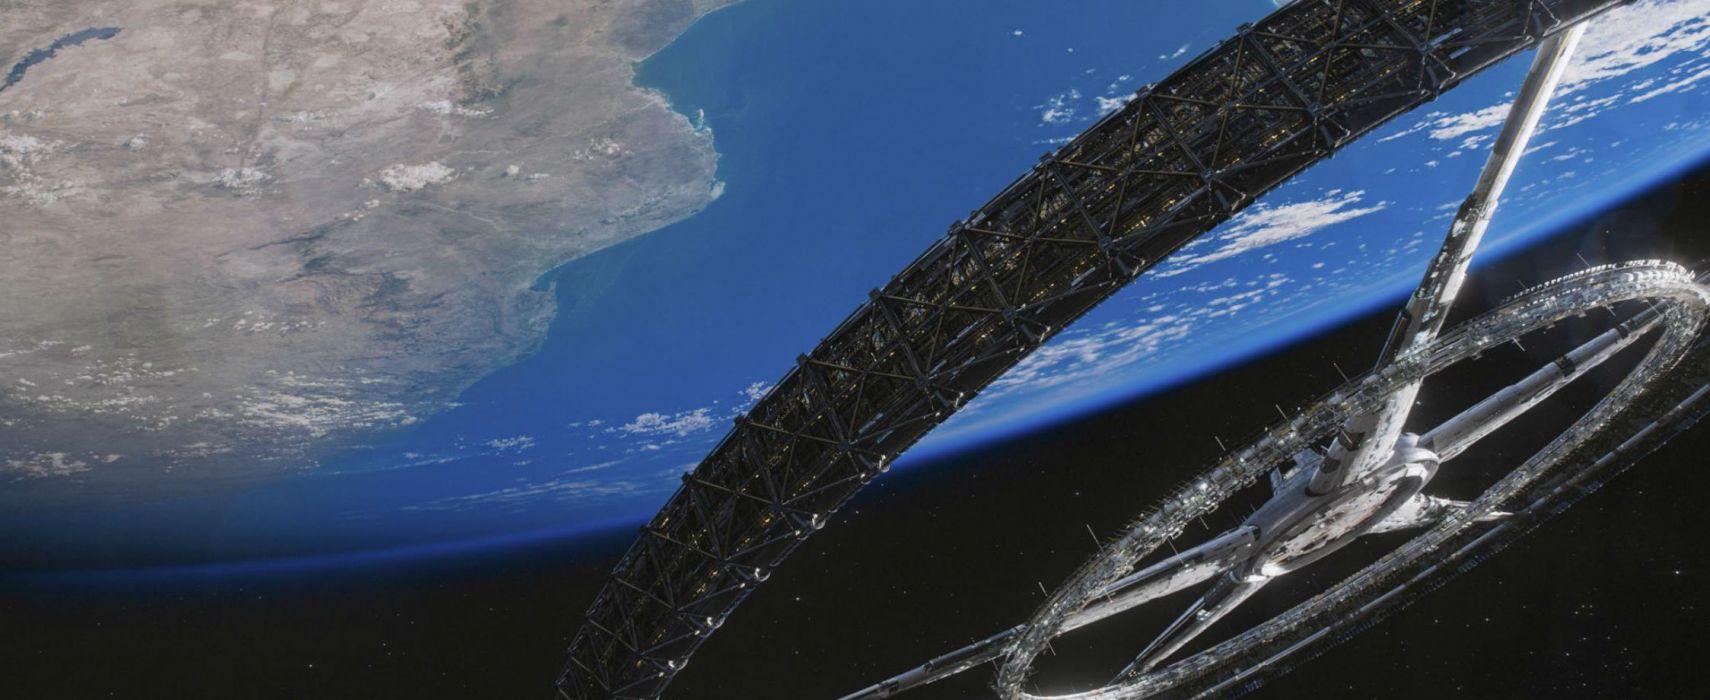 Elysium 2013 sci-fi futuristic apocalyptic future spaceship space planet planets earth wallpaper